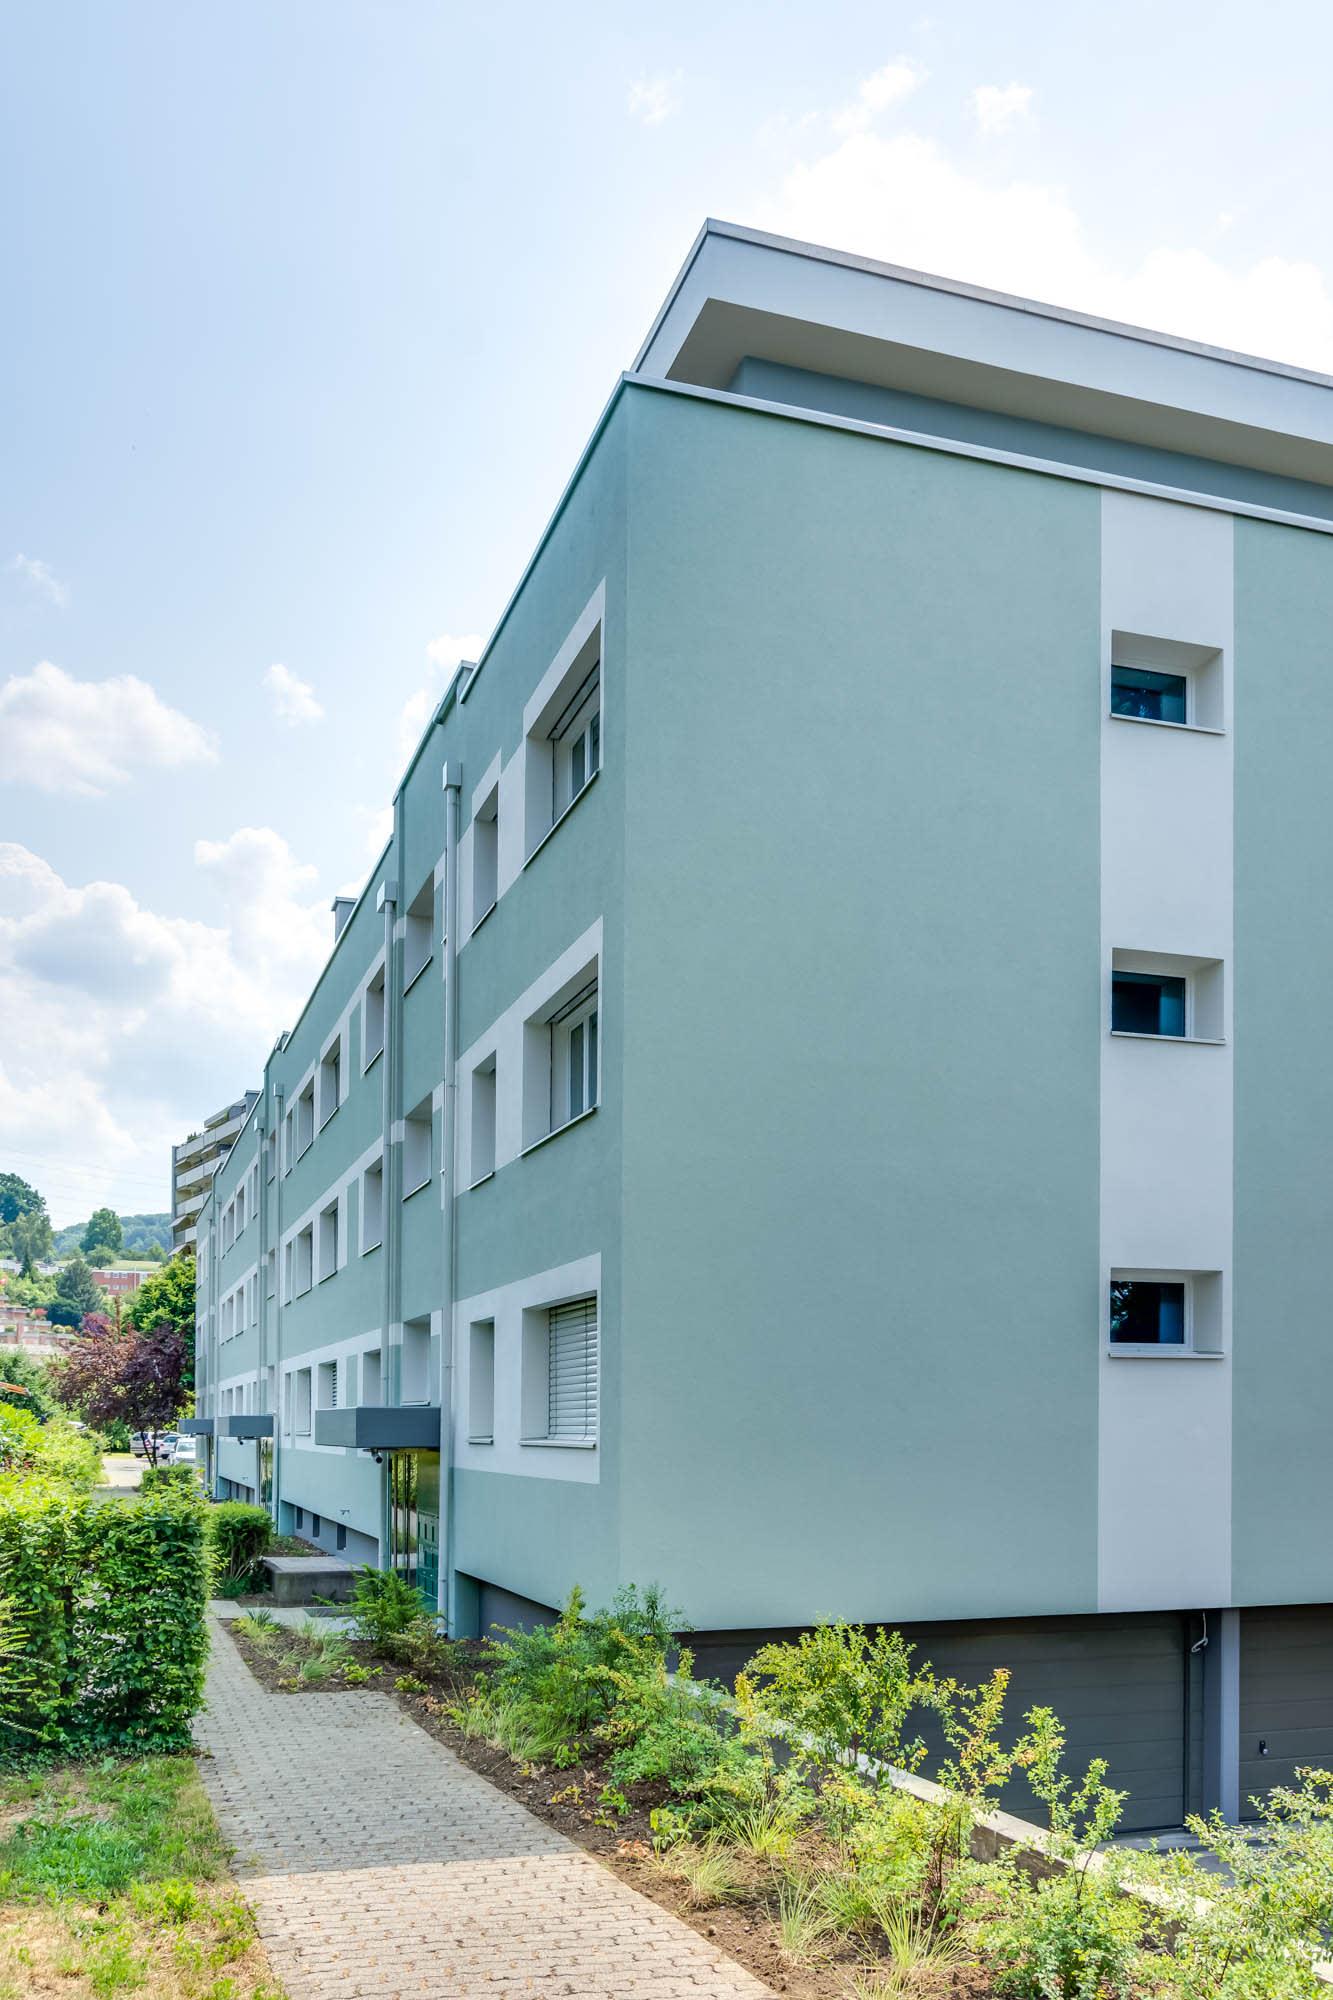 Oberfeldstrasse 33b